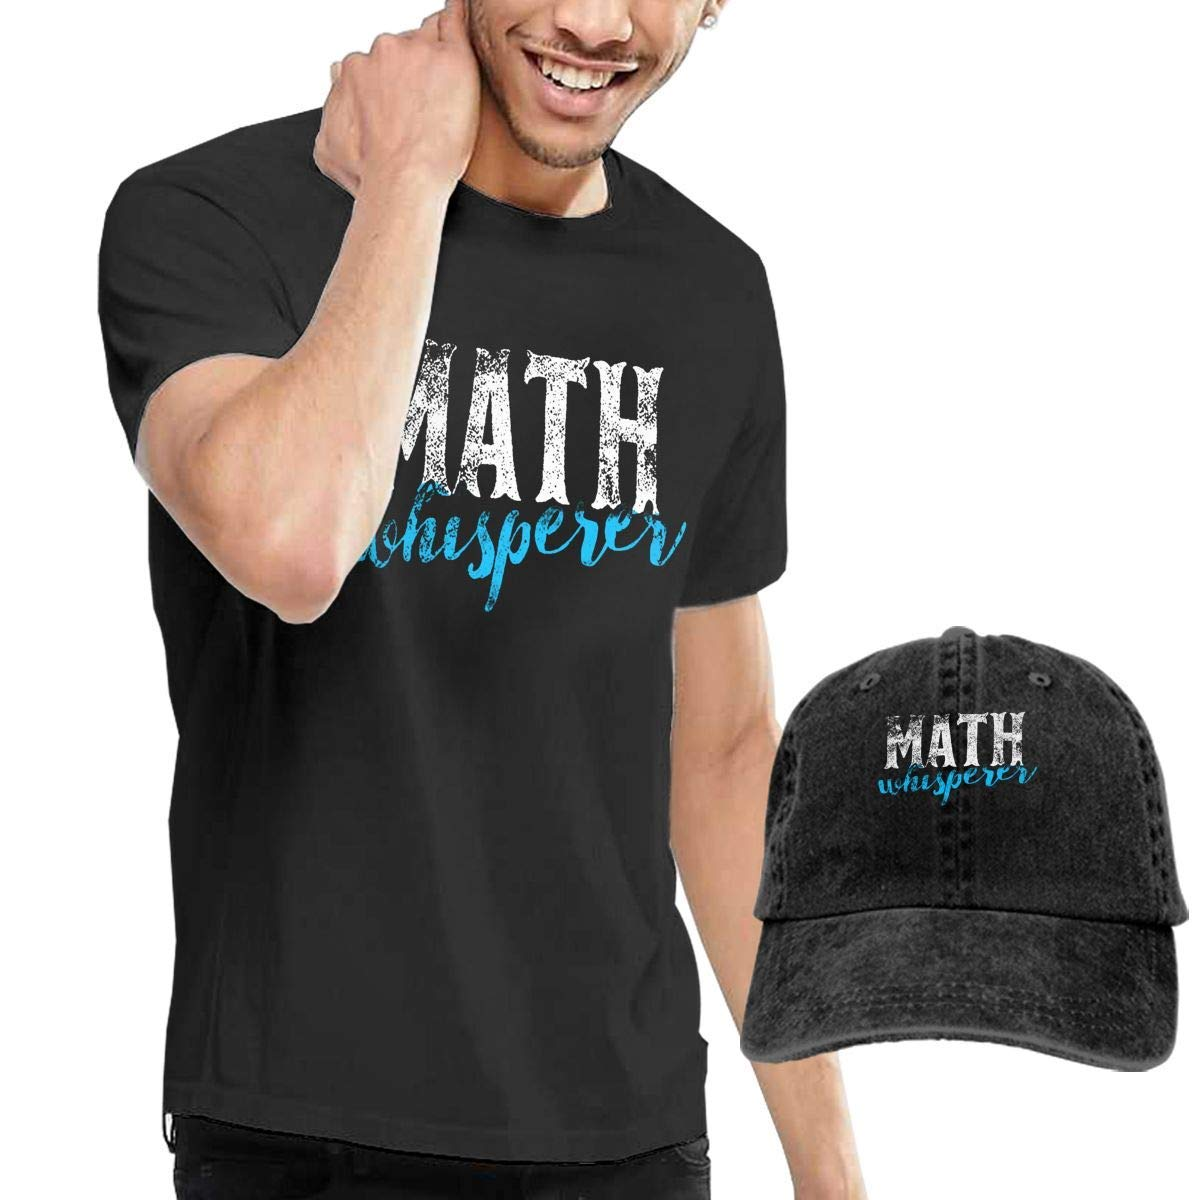 YLJIA Math Whisperer Mens Casual Short Sleeve Slim-Fit T-Shirt /& Baseball Caps Black 34